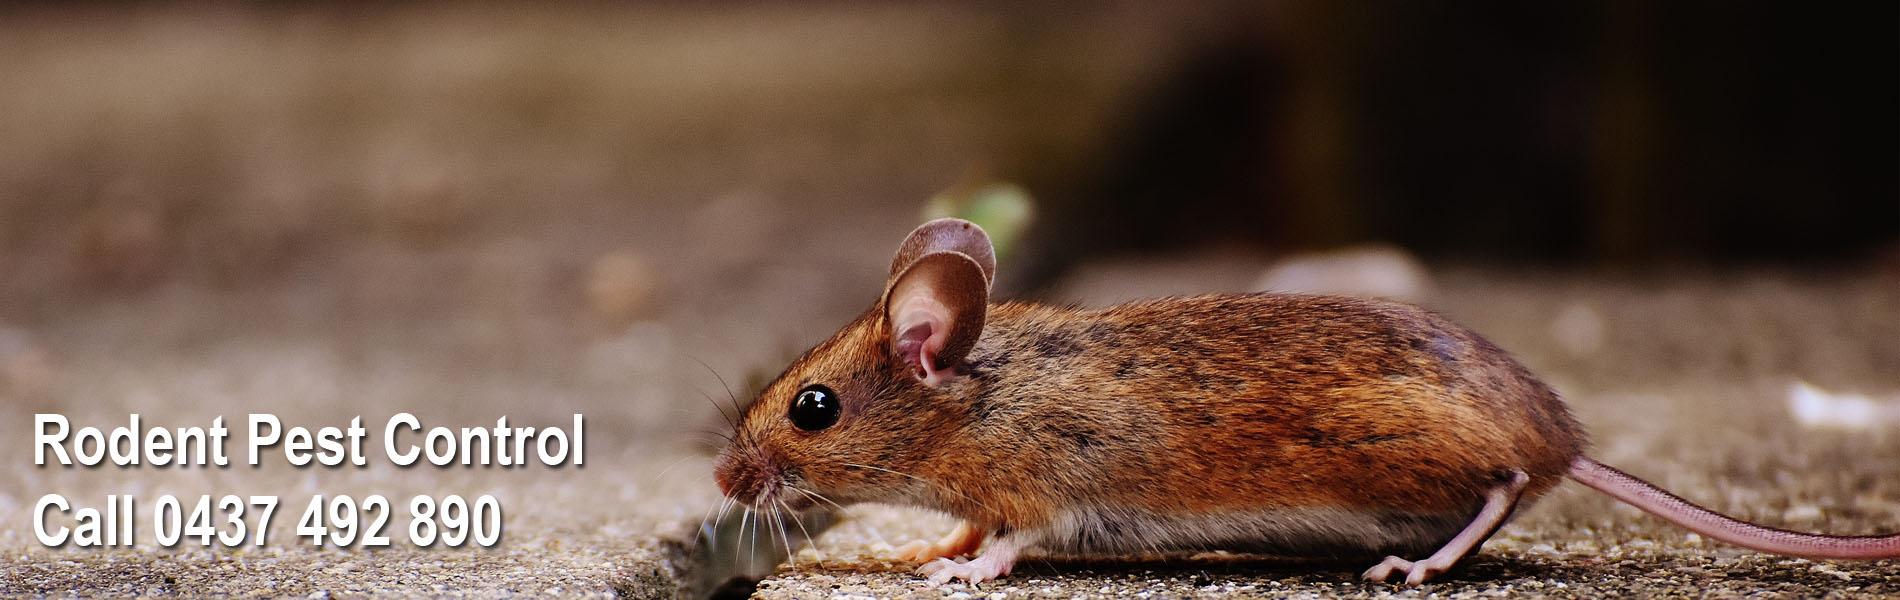 rodent pest control sydney